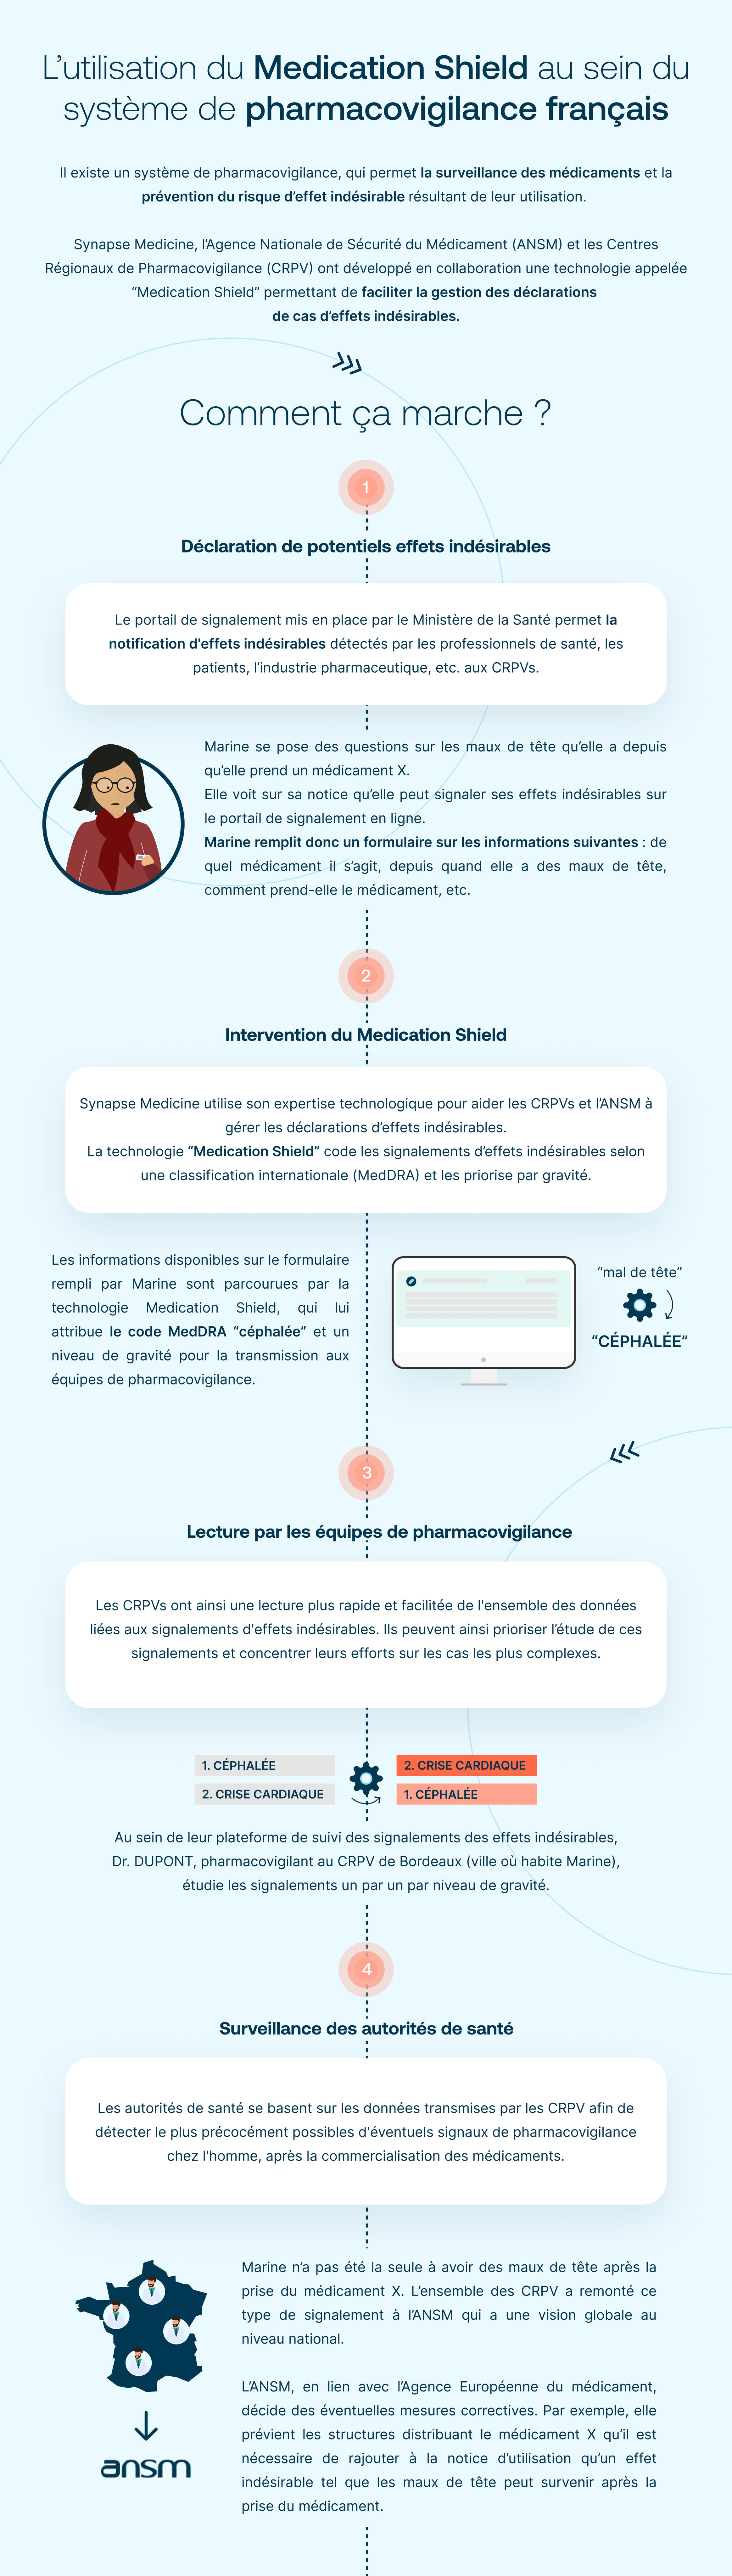 Medication Shield et pharmacovigilance